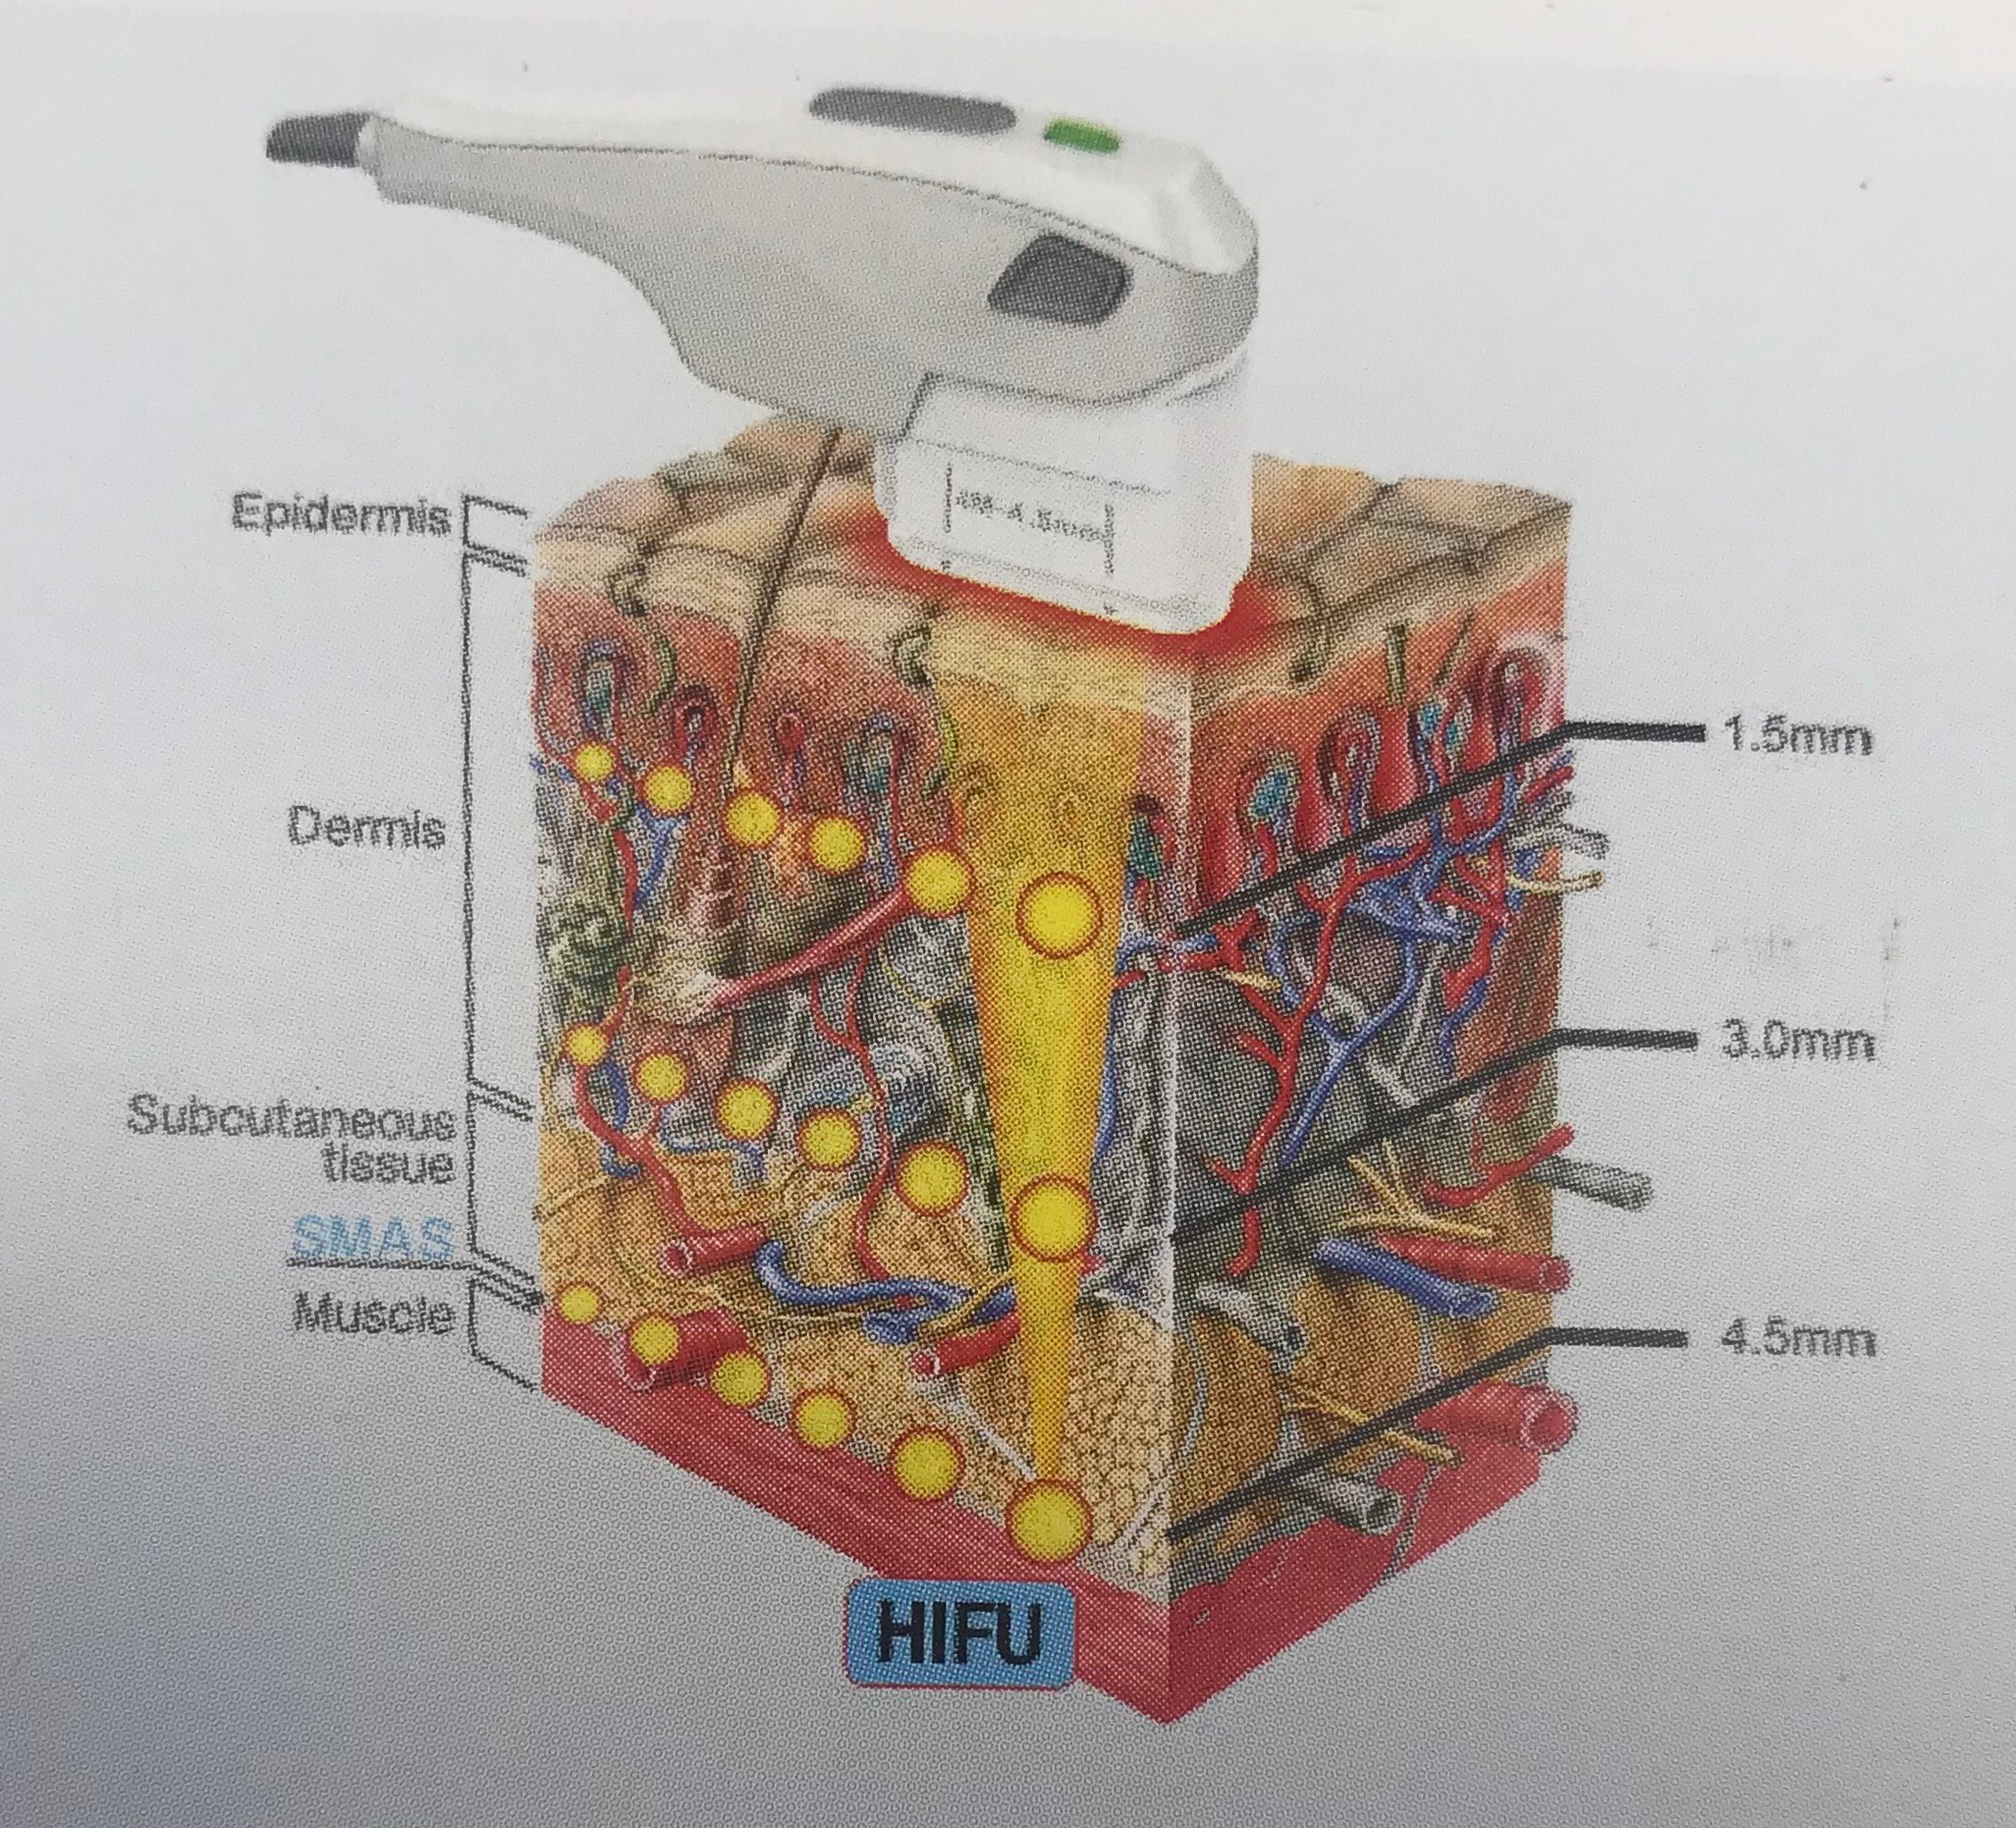 HIFU – Flawless Aesthetics